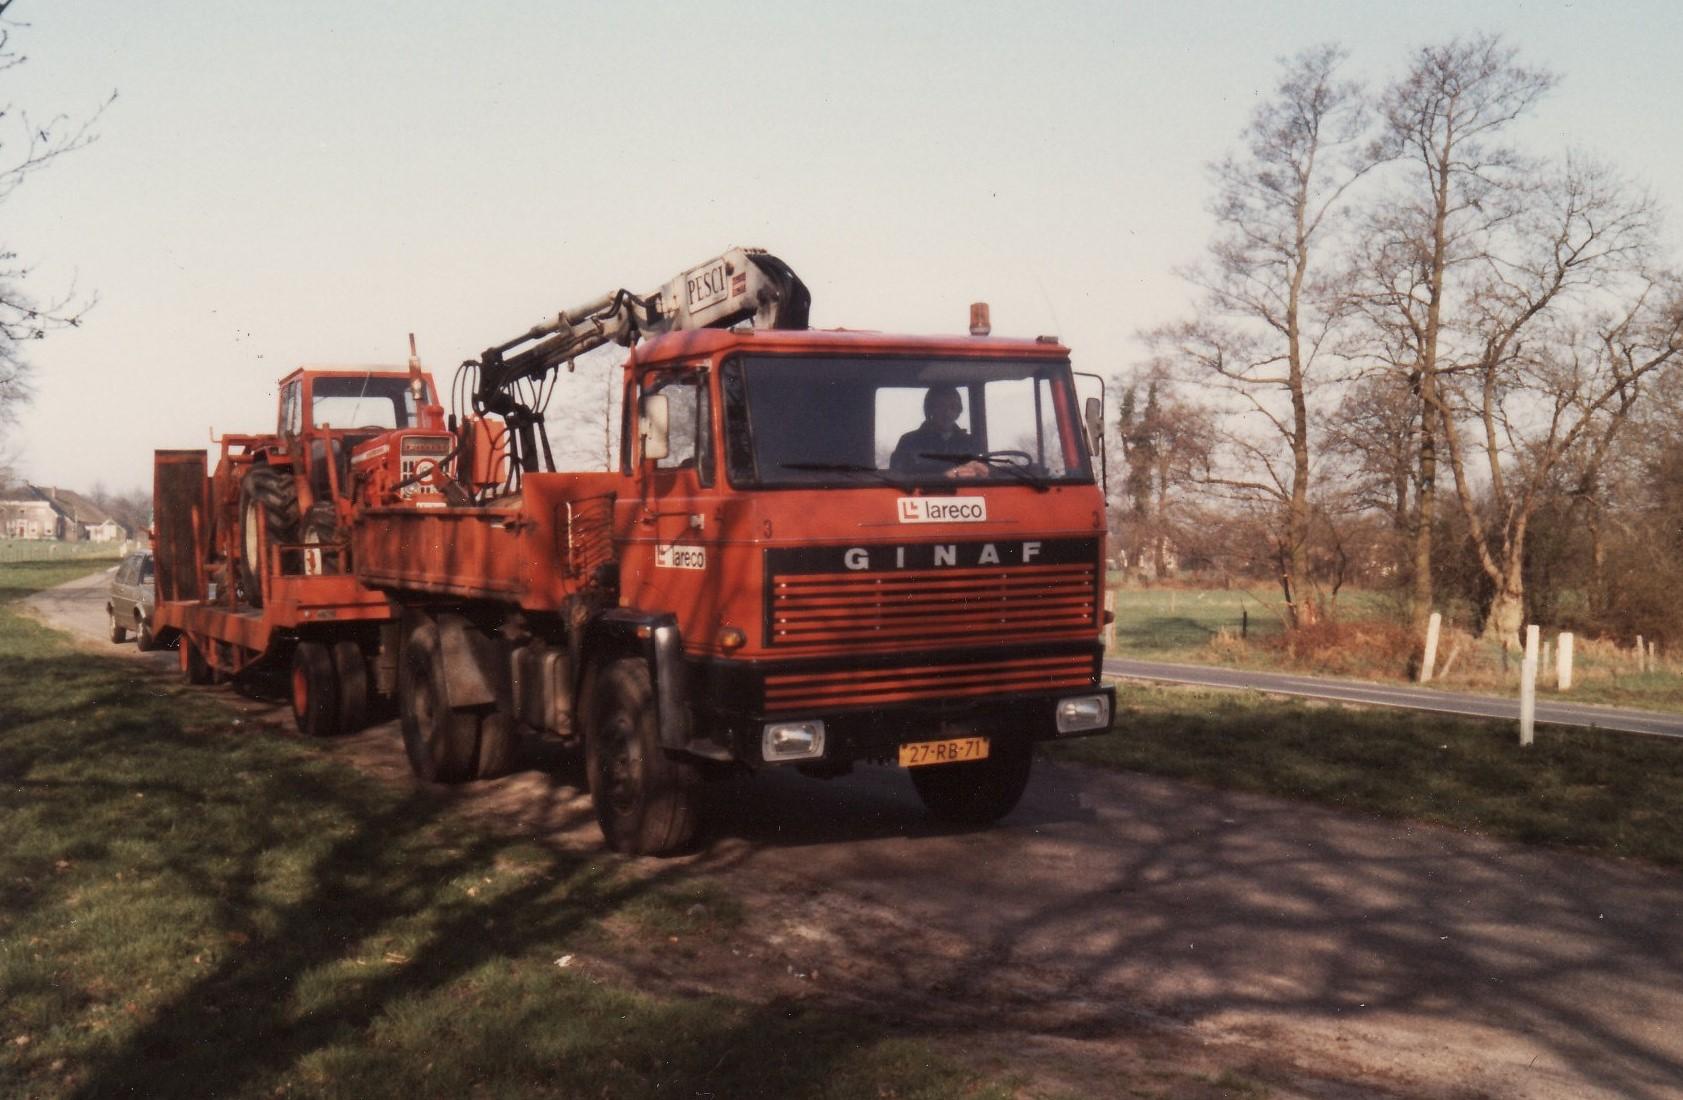 Lareco--GINAF-met-een-FORD-Ketting-sleuven-graver-op-de-dieplader-2